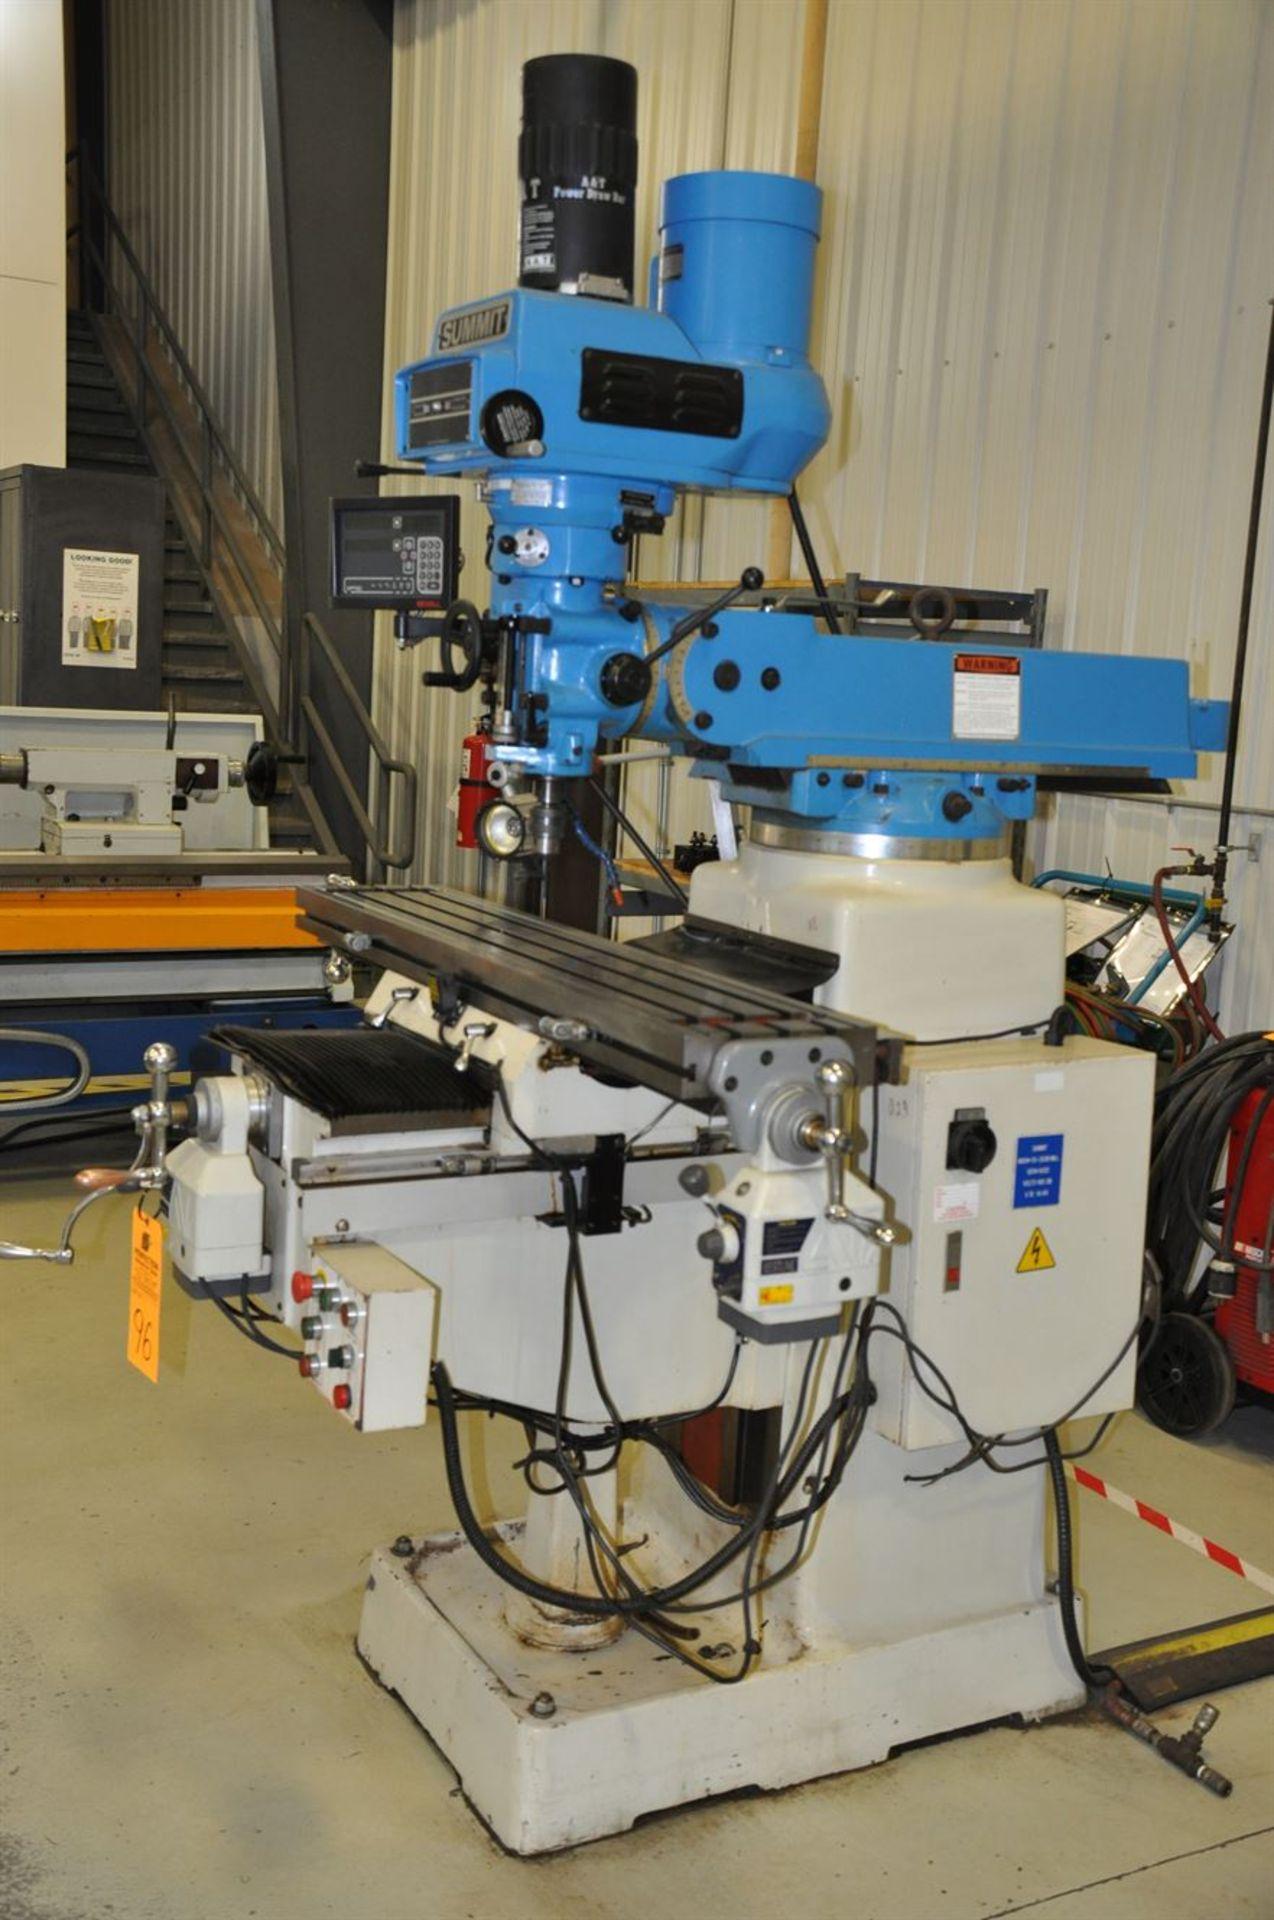 2012 SUMMIT VS-350B 3 hp Mill, s/n 8052, w/ 3 Axis Power Table, 50-4200 Vari-Speed RPM, NEWALL DP700 - Image 2 of 2